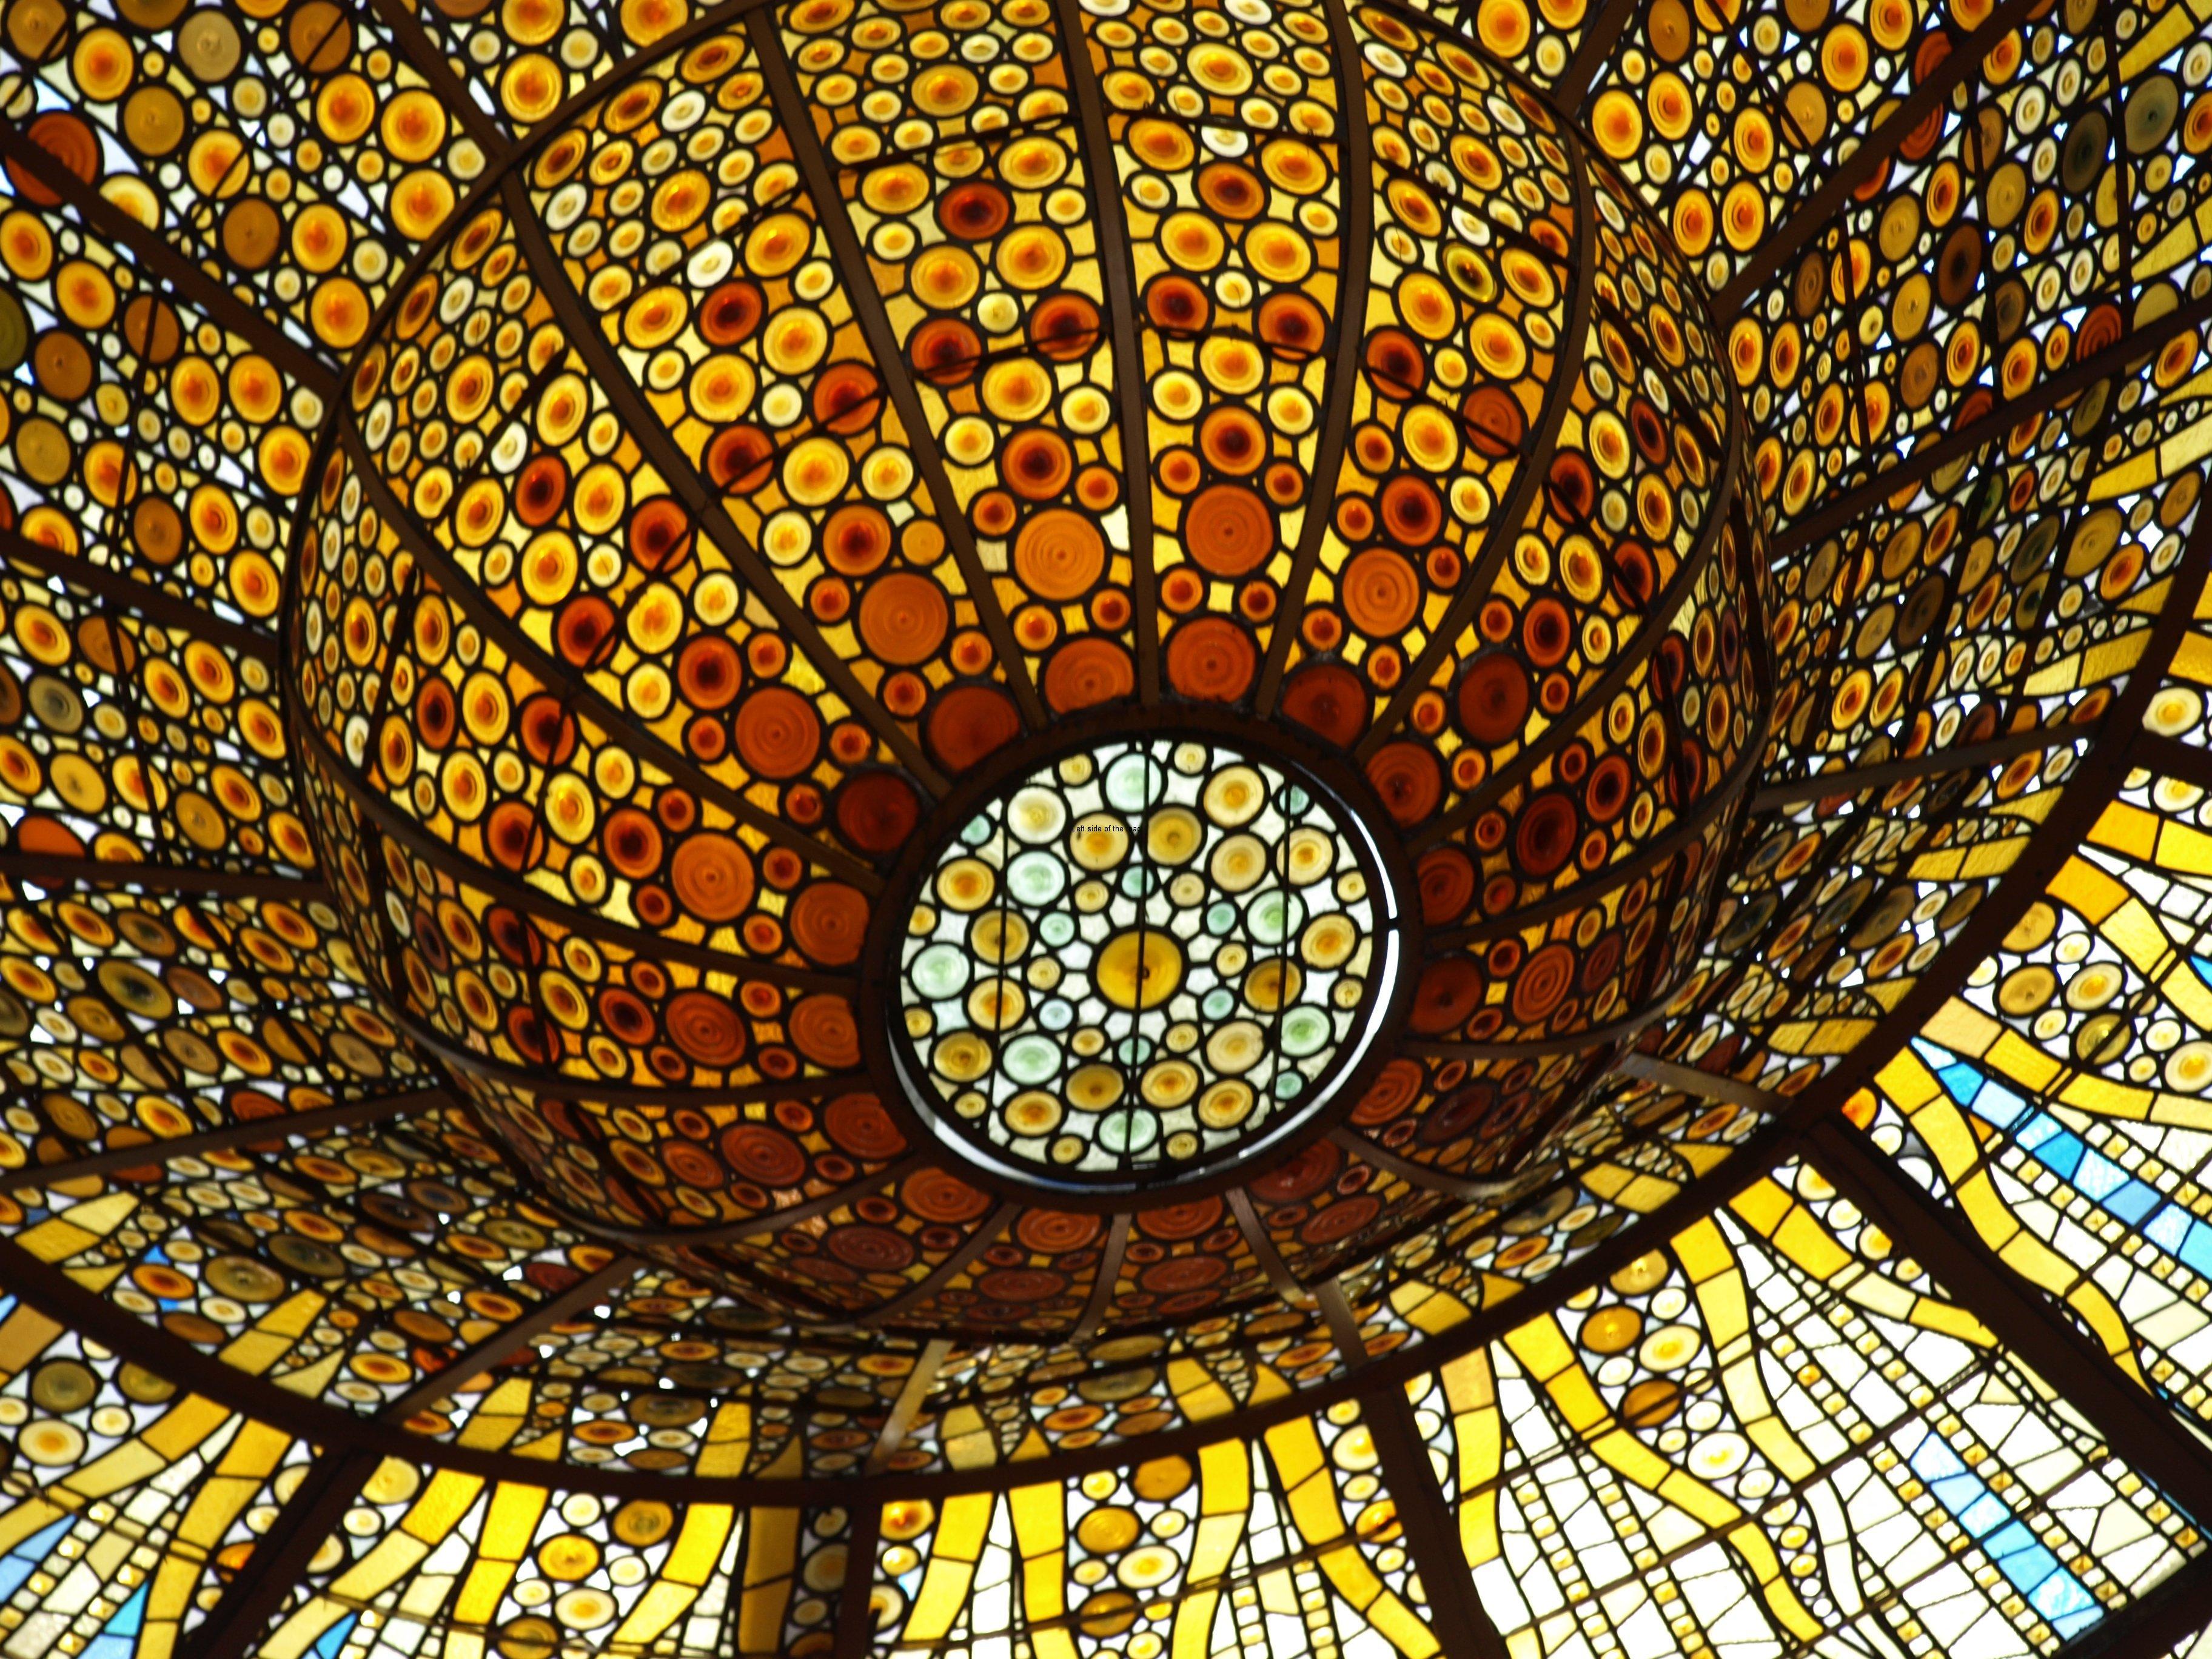 Palau de la Musica Orfeo Catala